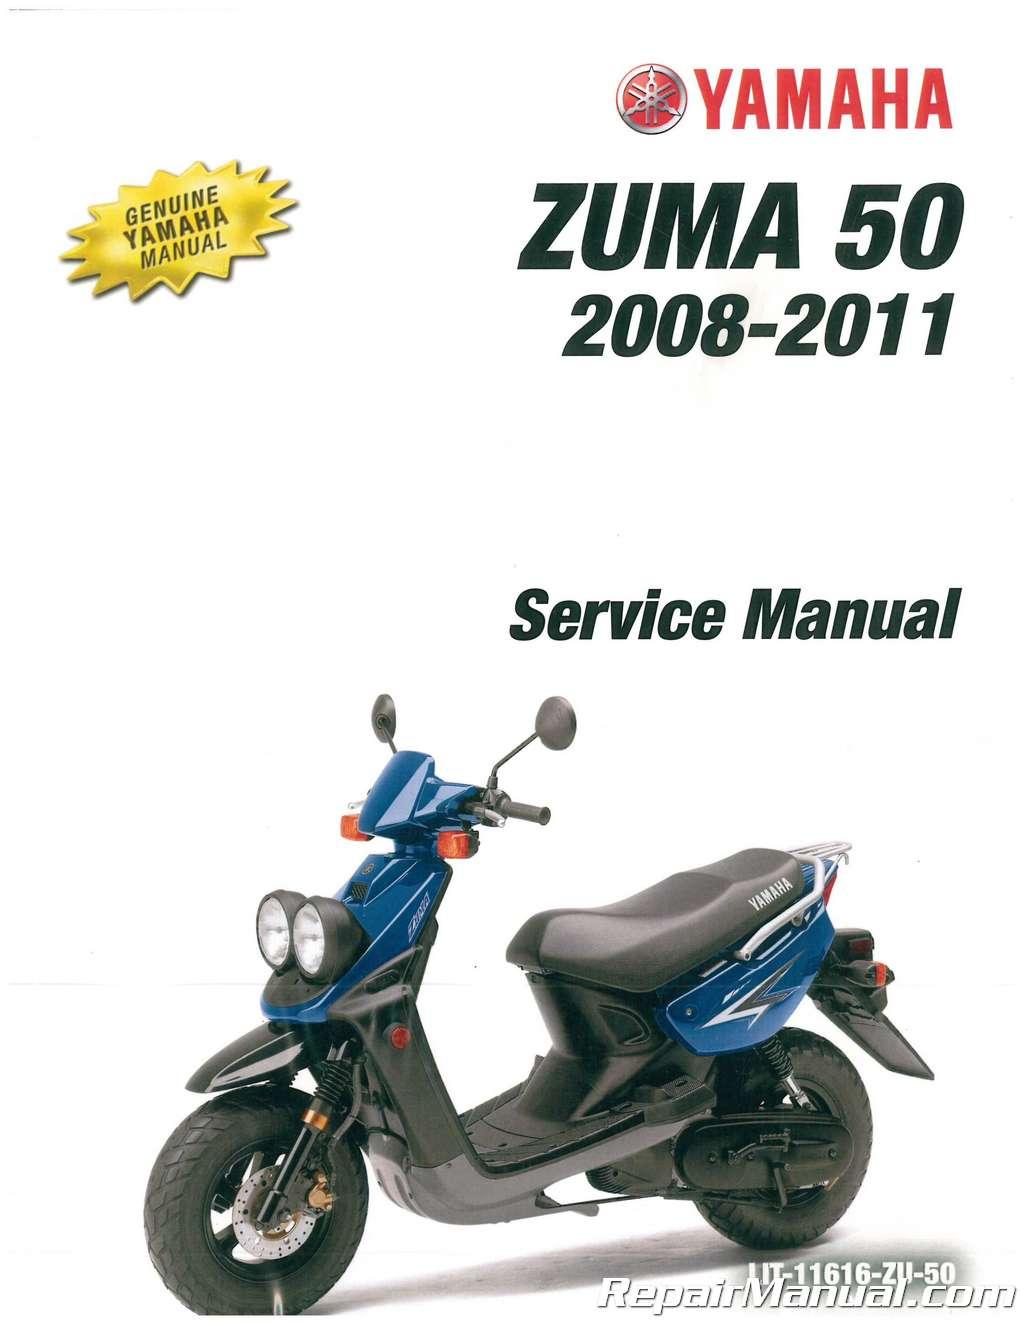 2008 2011 yamaha yw50 zuma scooter service manual rh repairmanual com yamaha bws user manual yamaha zuma 50 owners manual